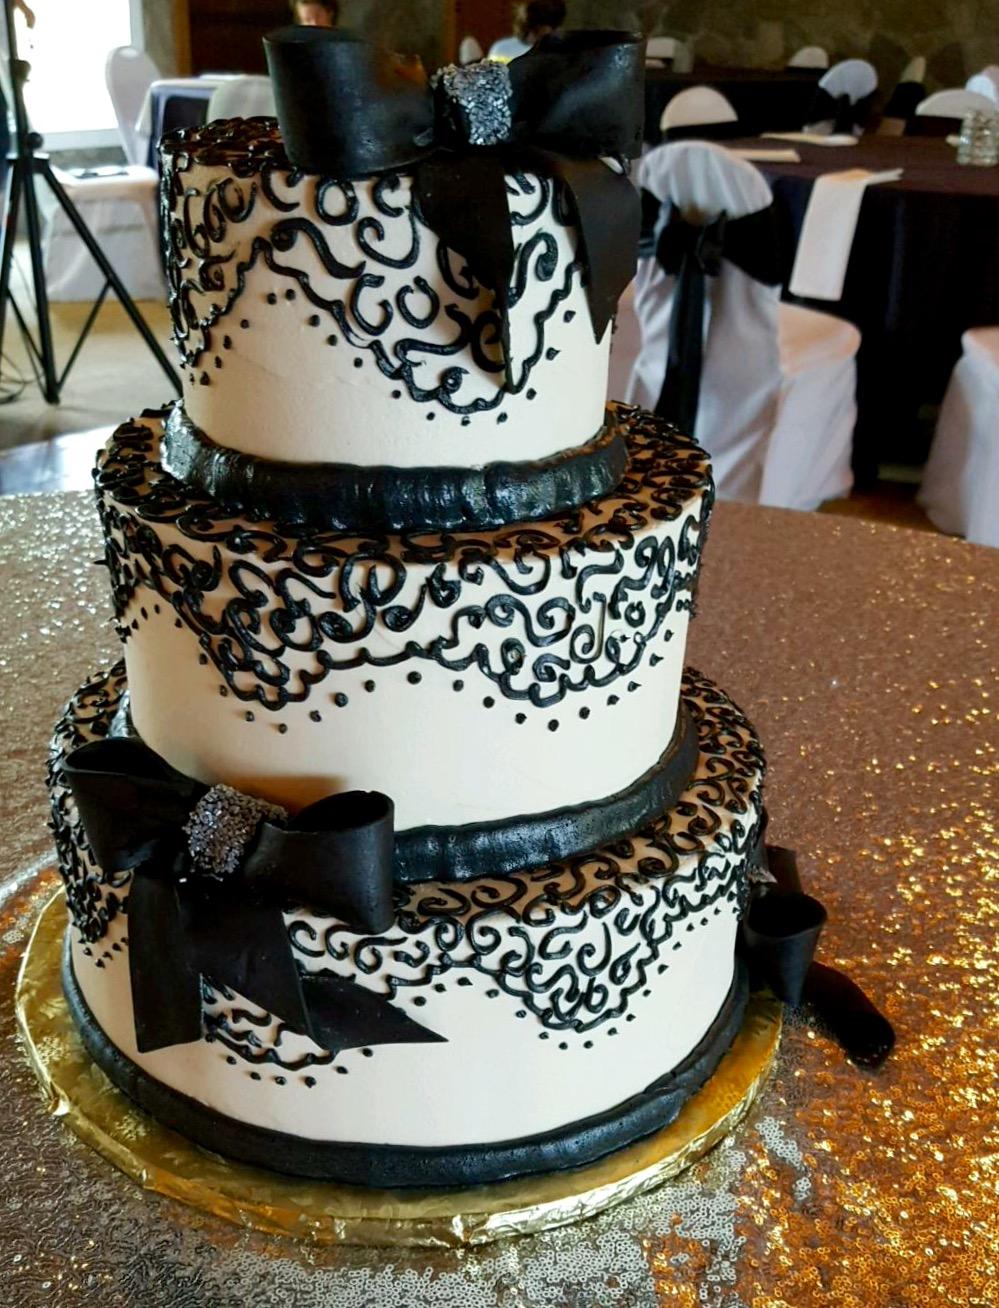 Wedding3tierblacklace.jpg